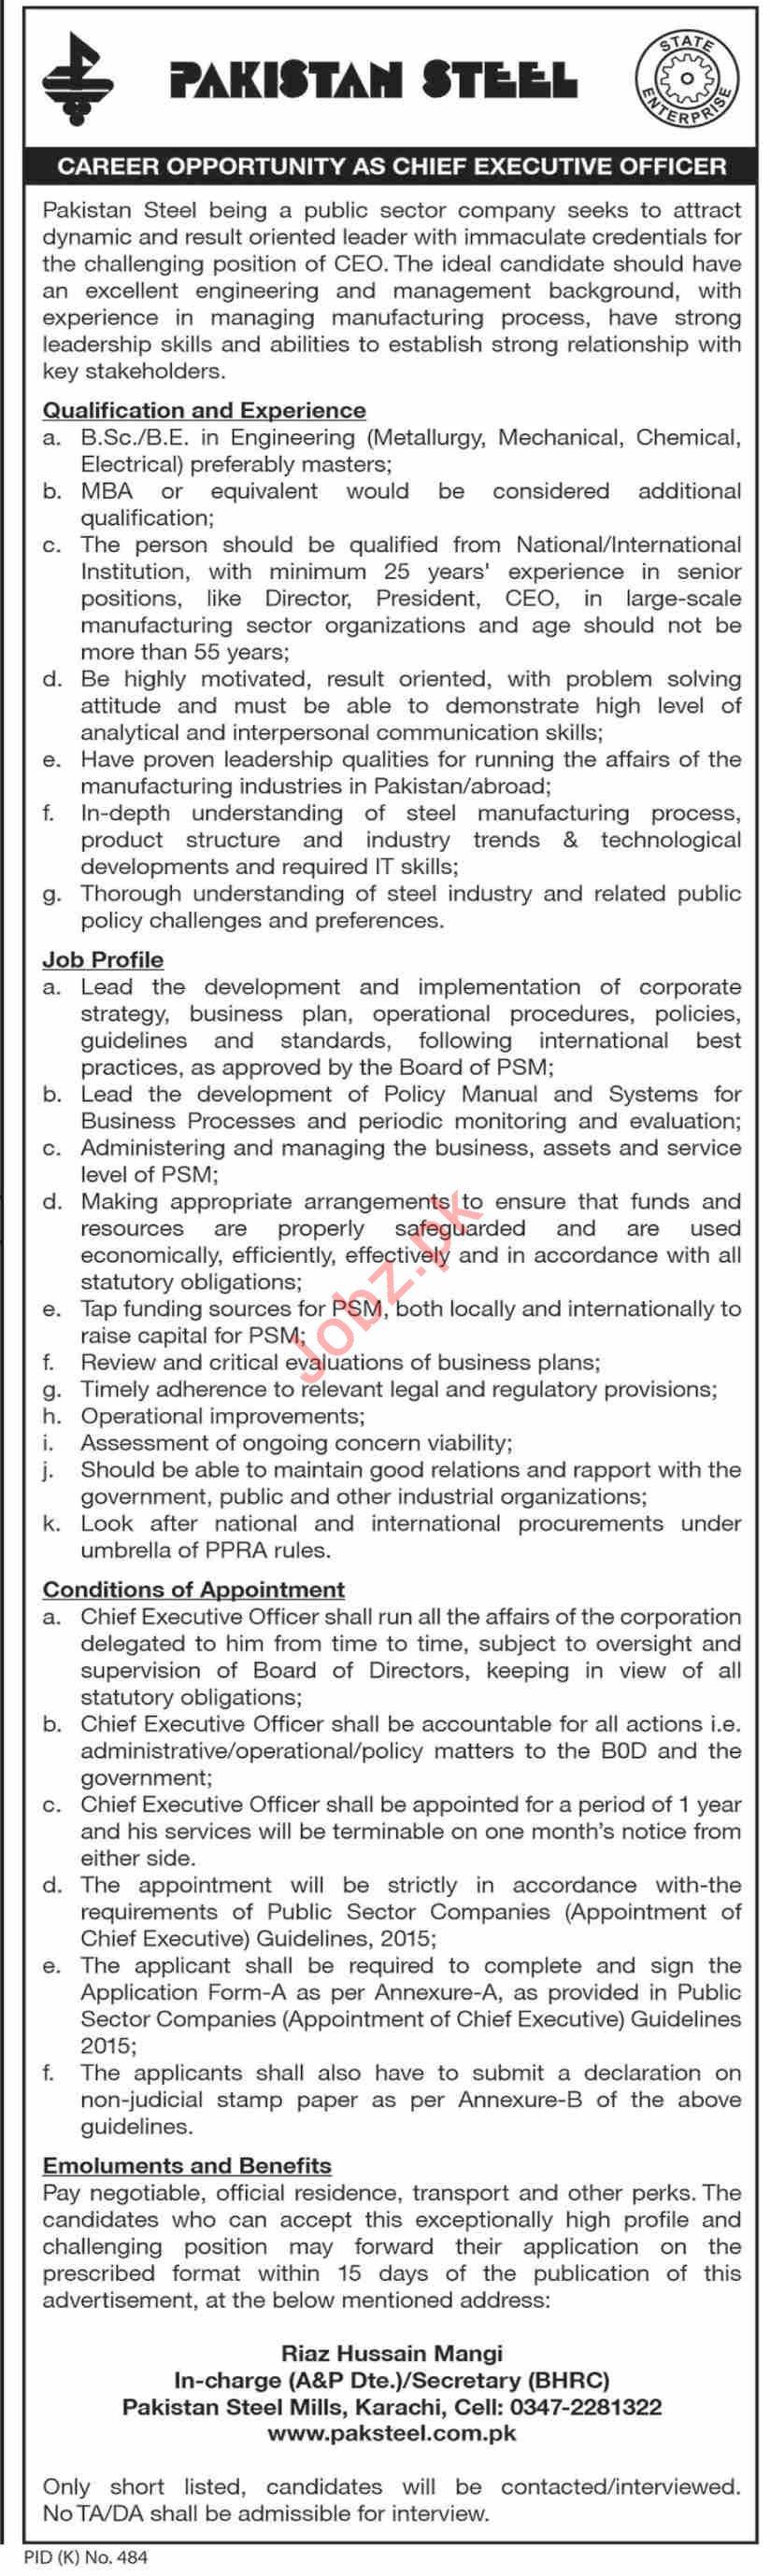 Pakistan Steel Mills Karachi Jobs 2019 for Executive Officer